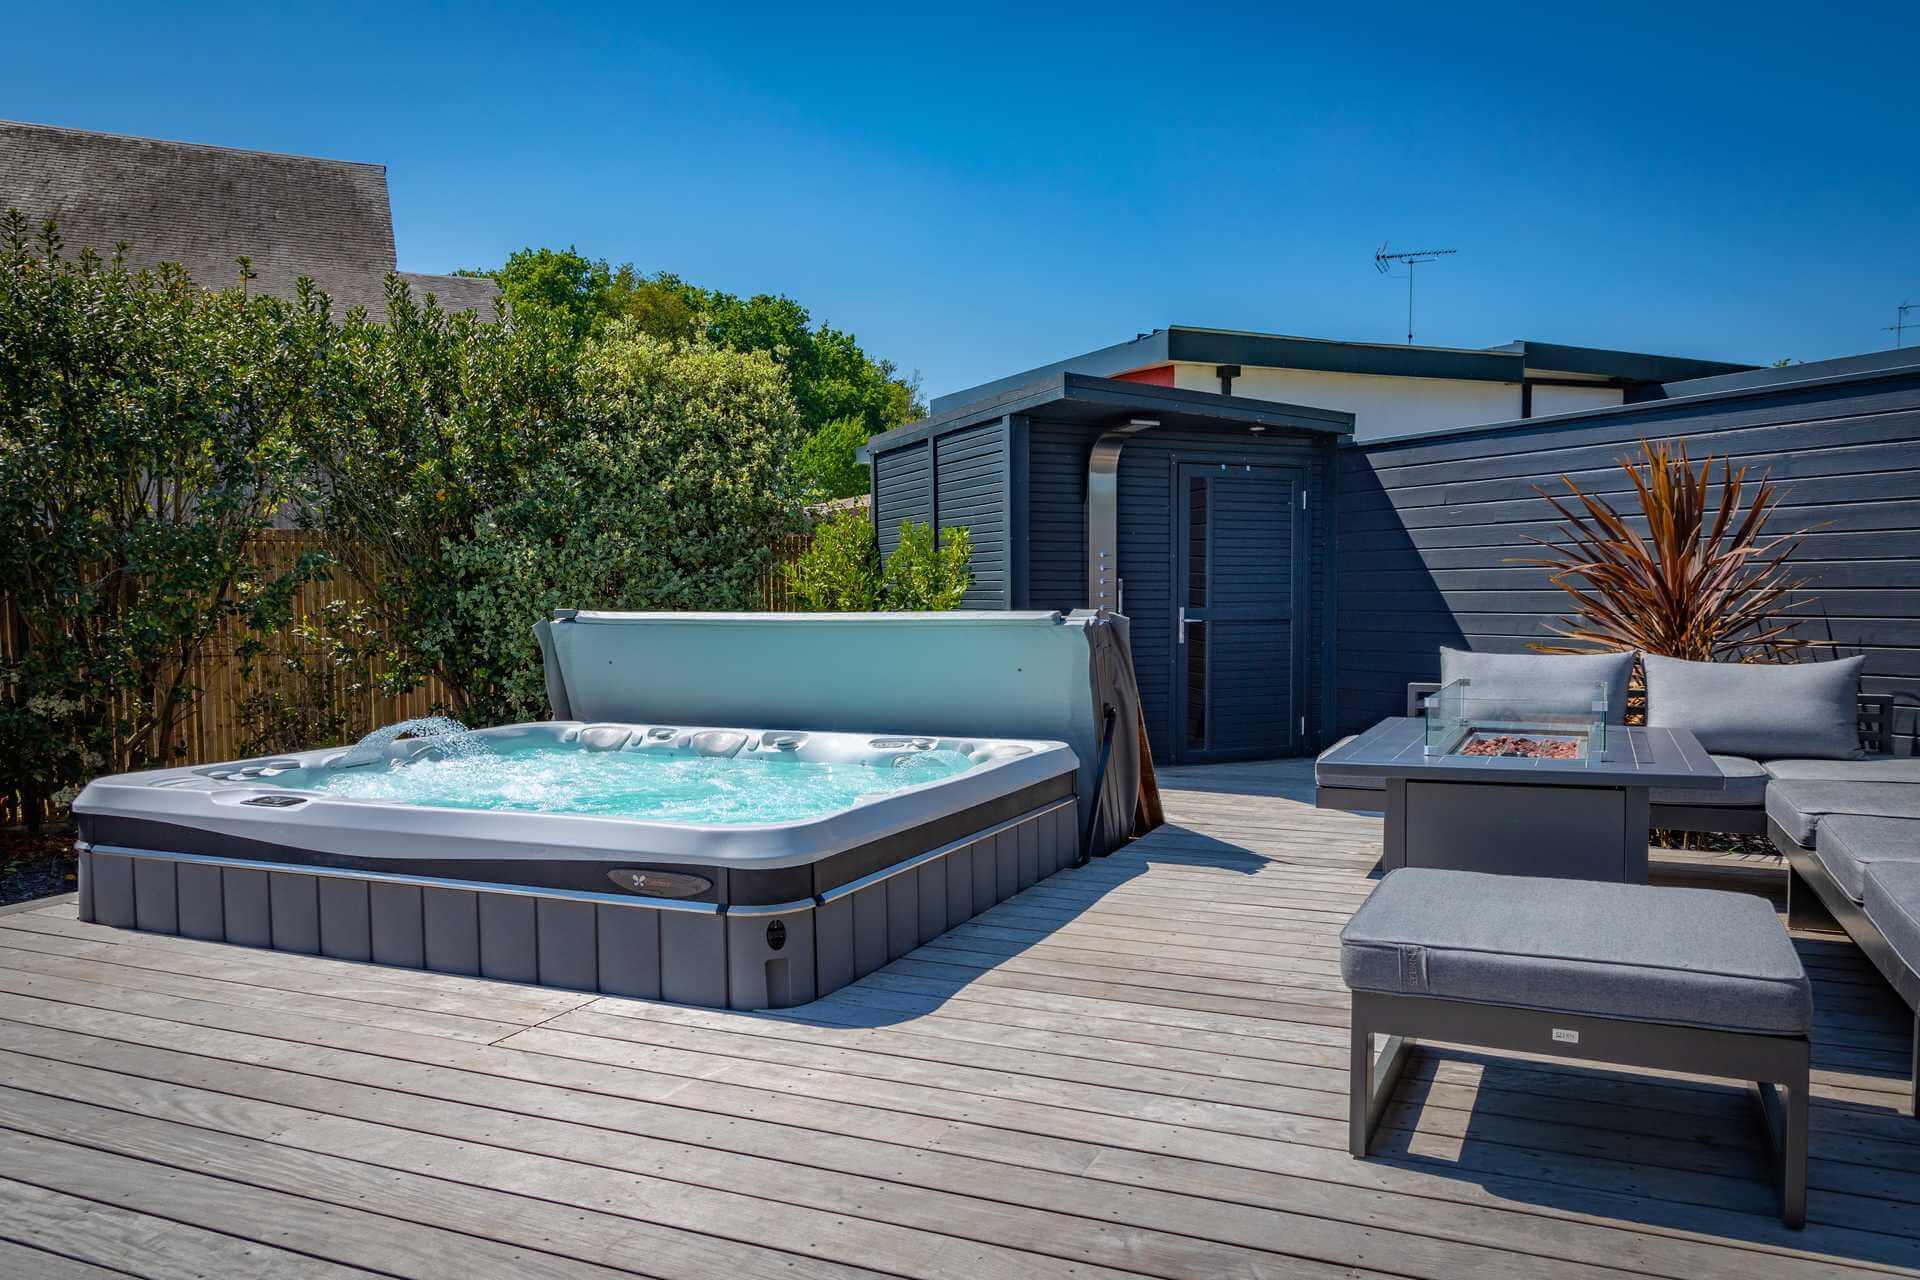 Installation spa Vannes Lorient Morbihan